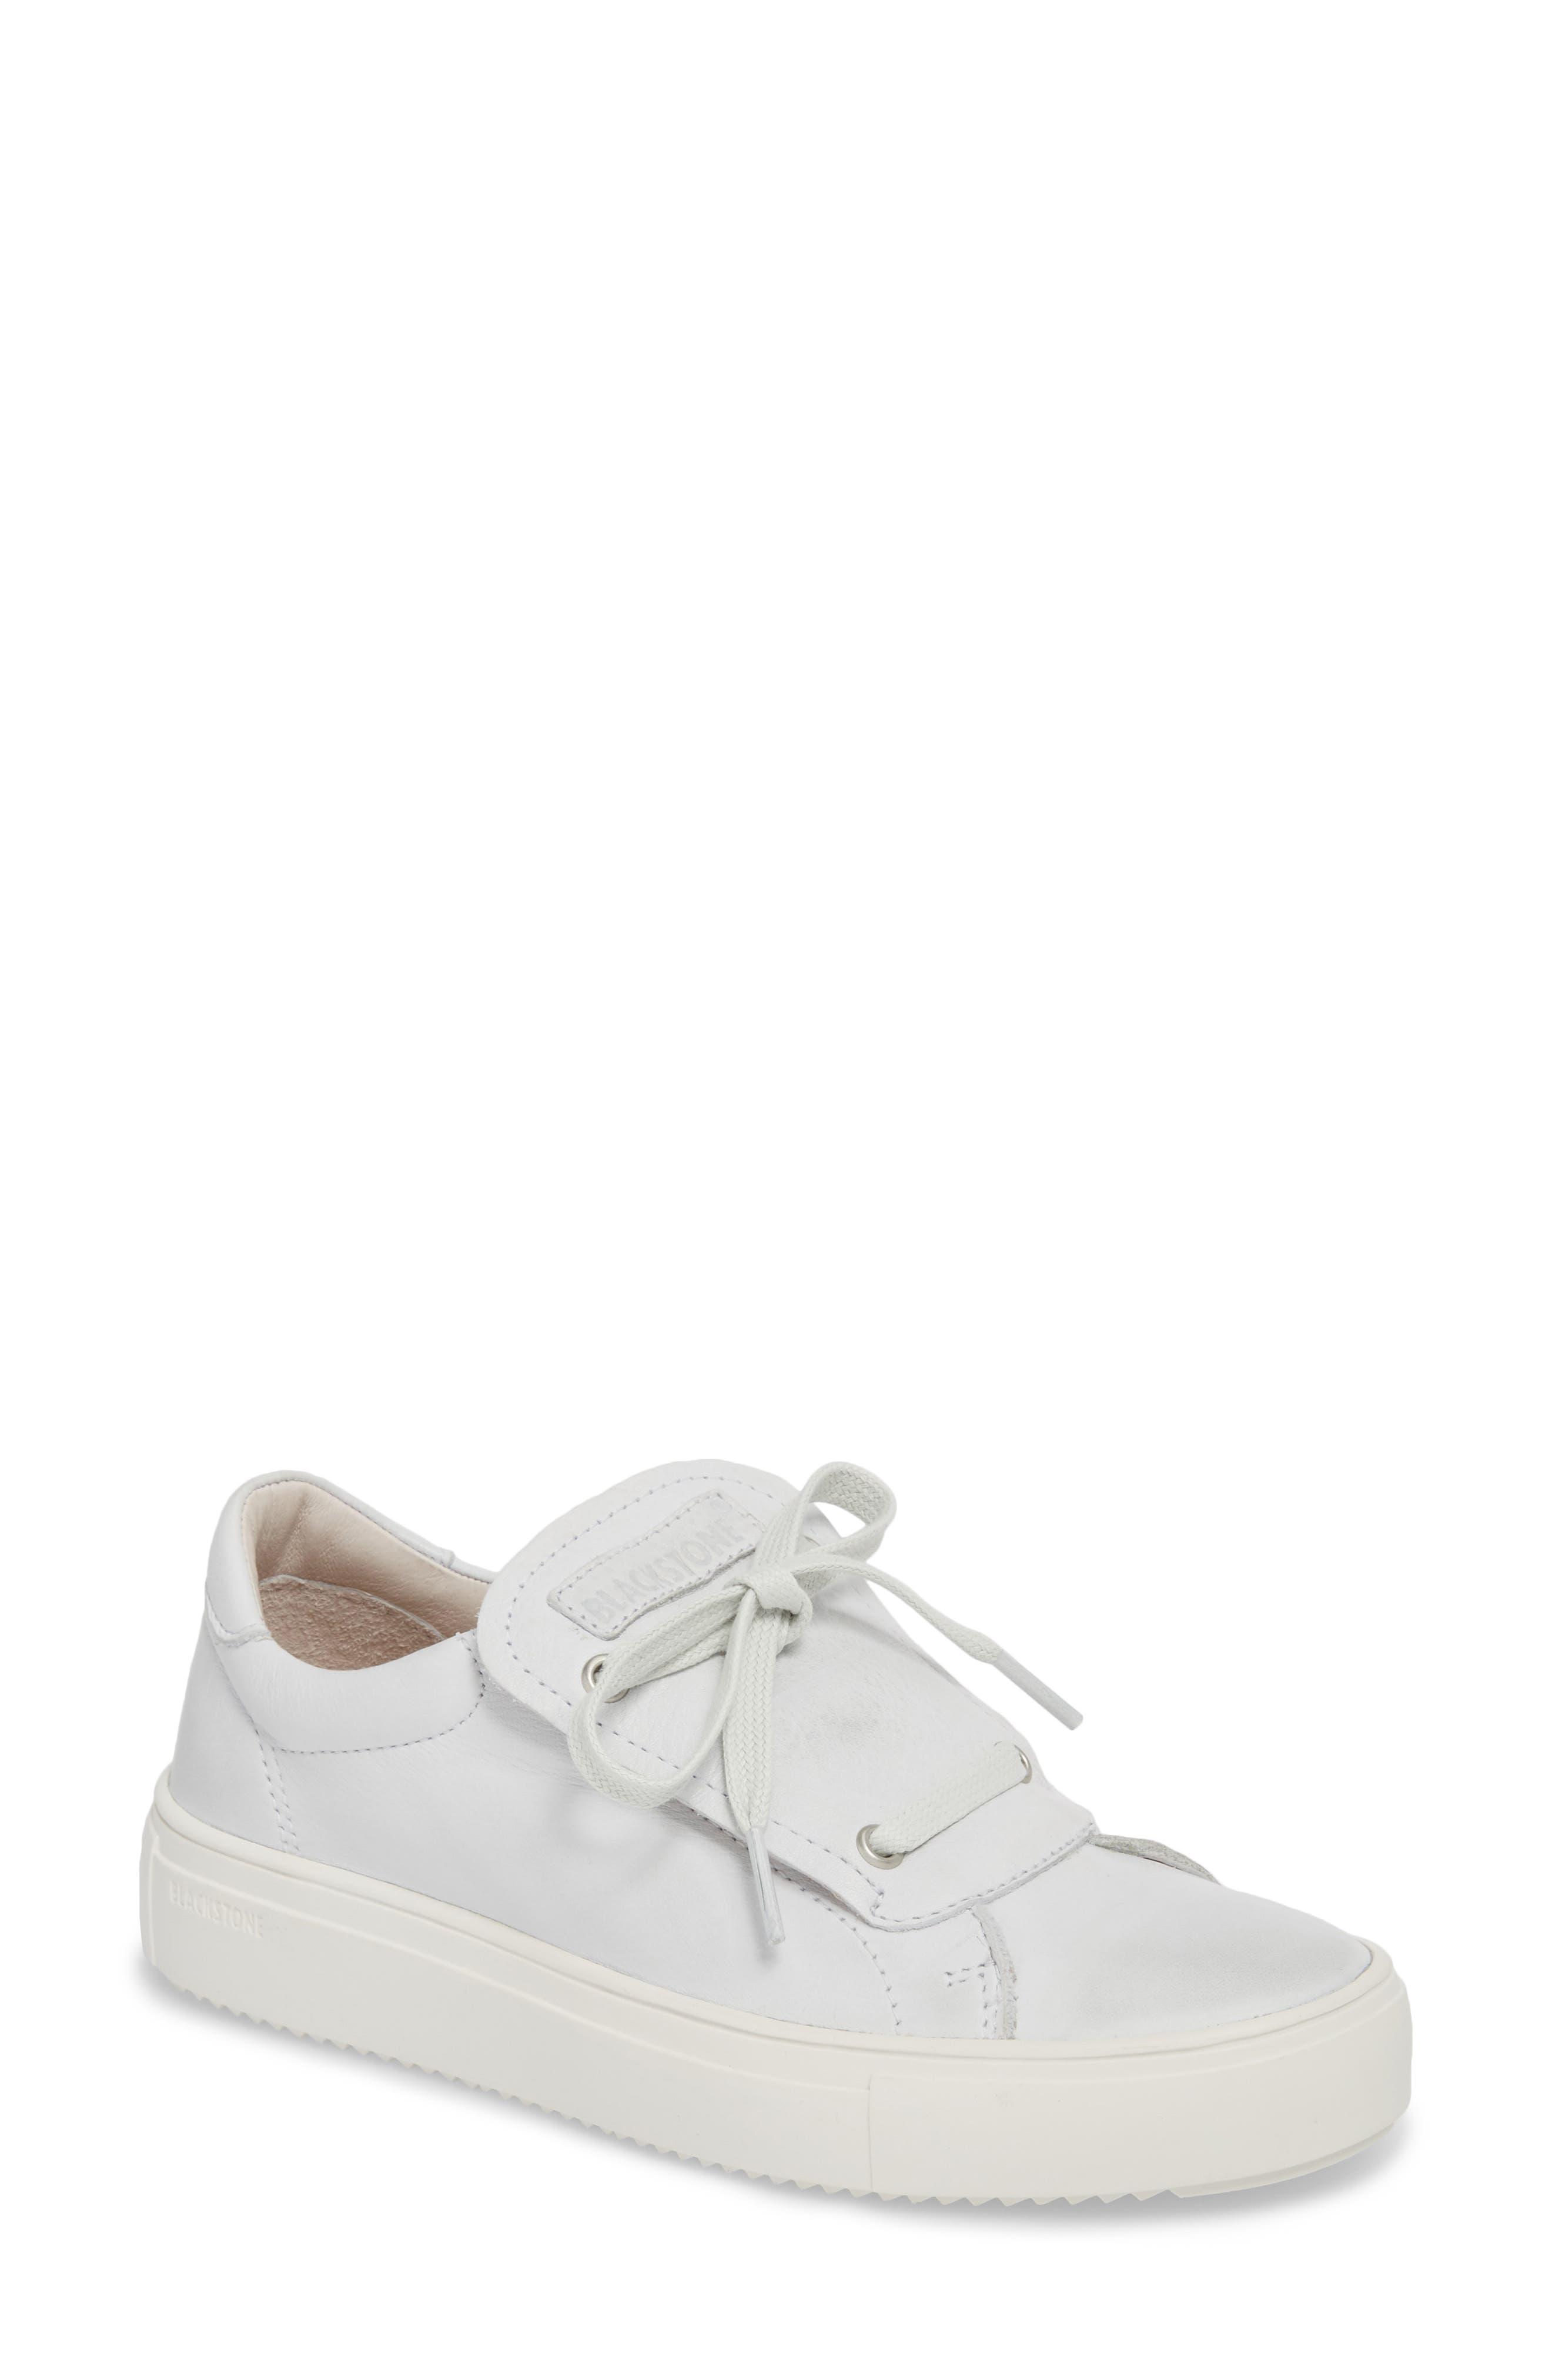 Blackstone Pl72 External Tongue Sneaker White